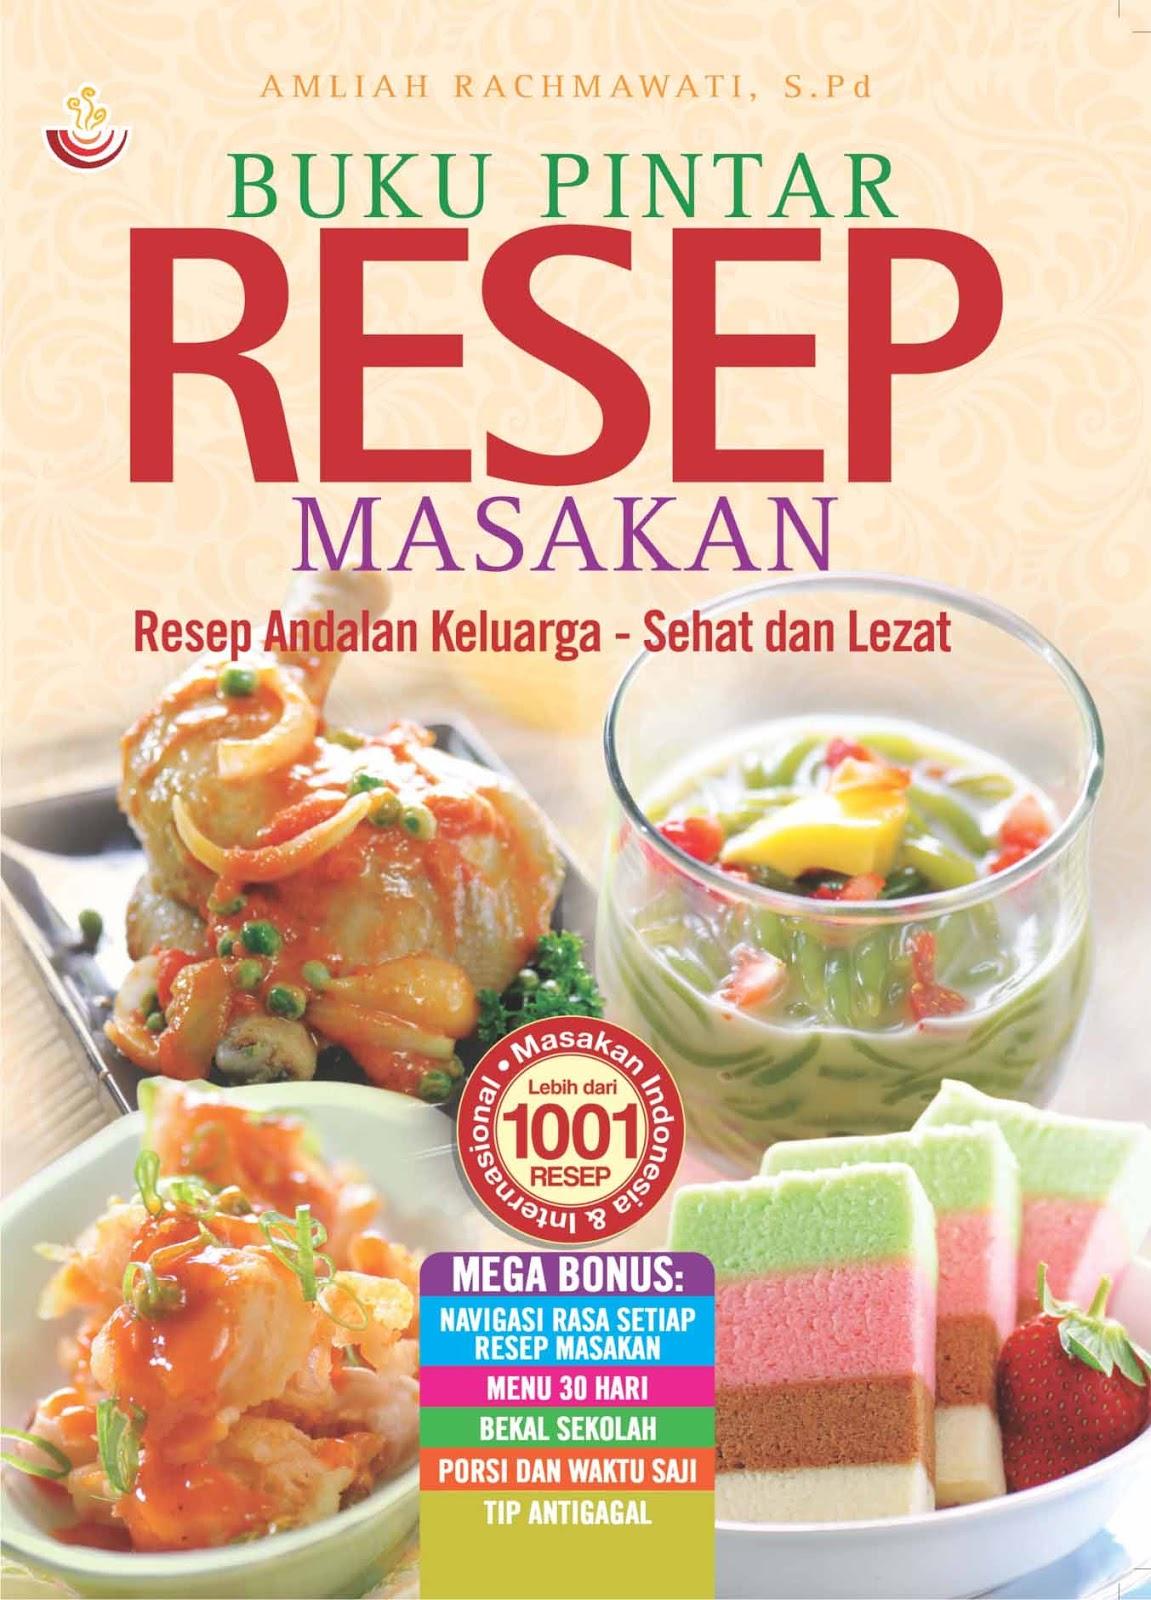 Buku Pintar Resep Masakan Buku Bagus Buku Rekomendasi Best